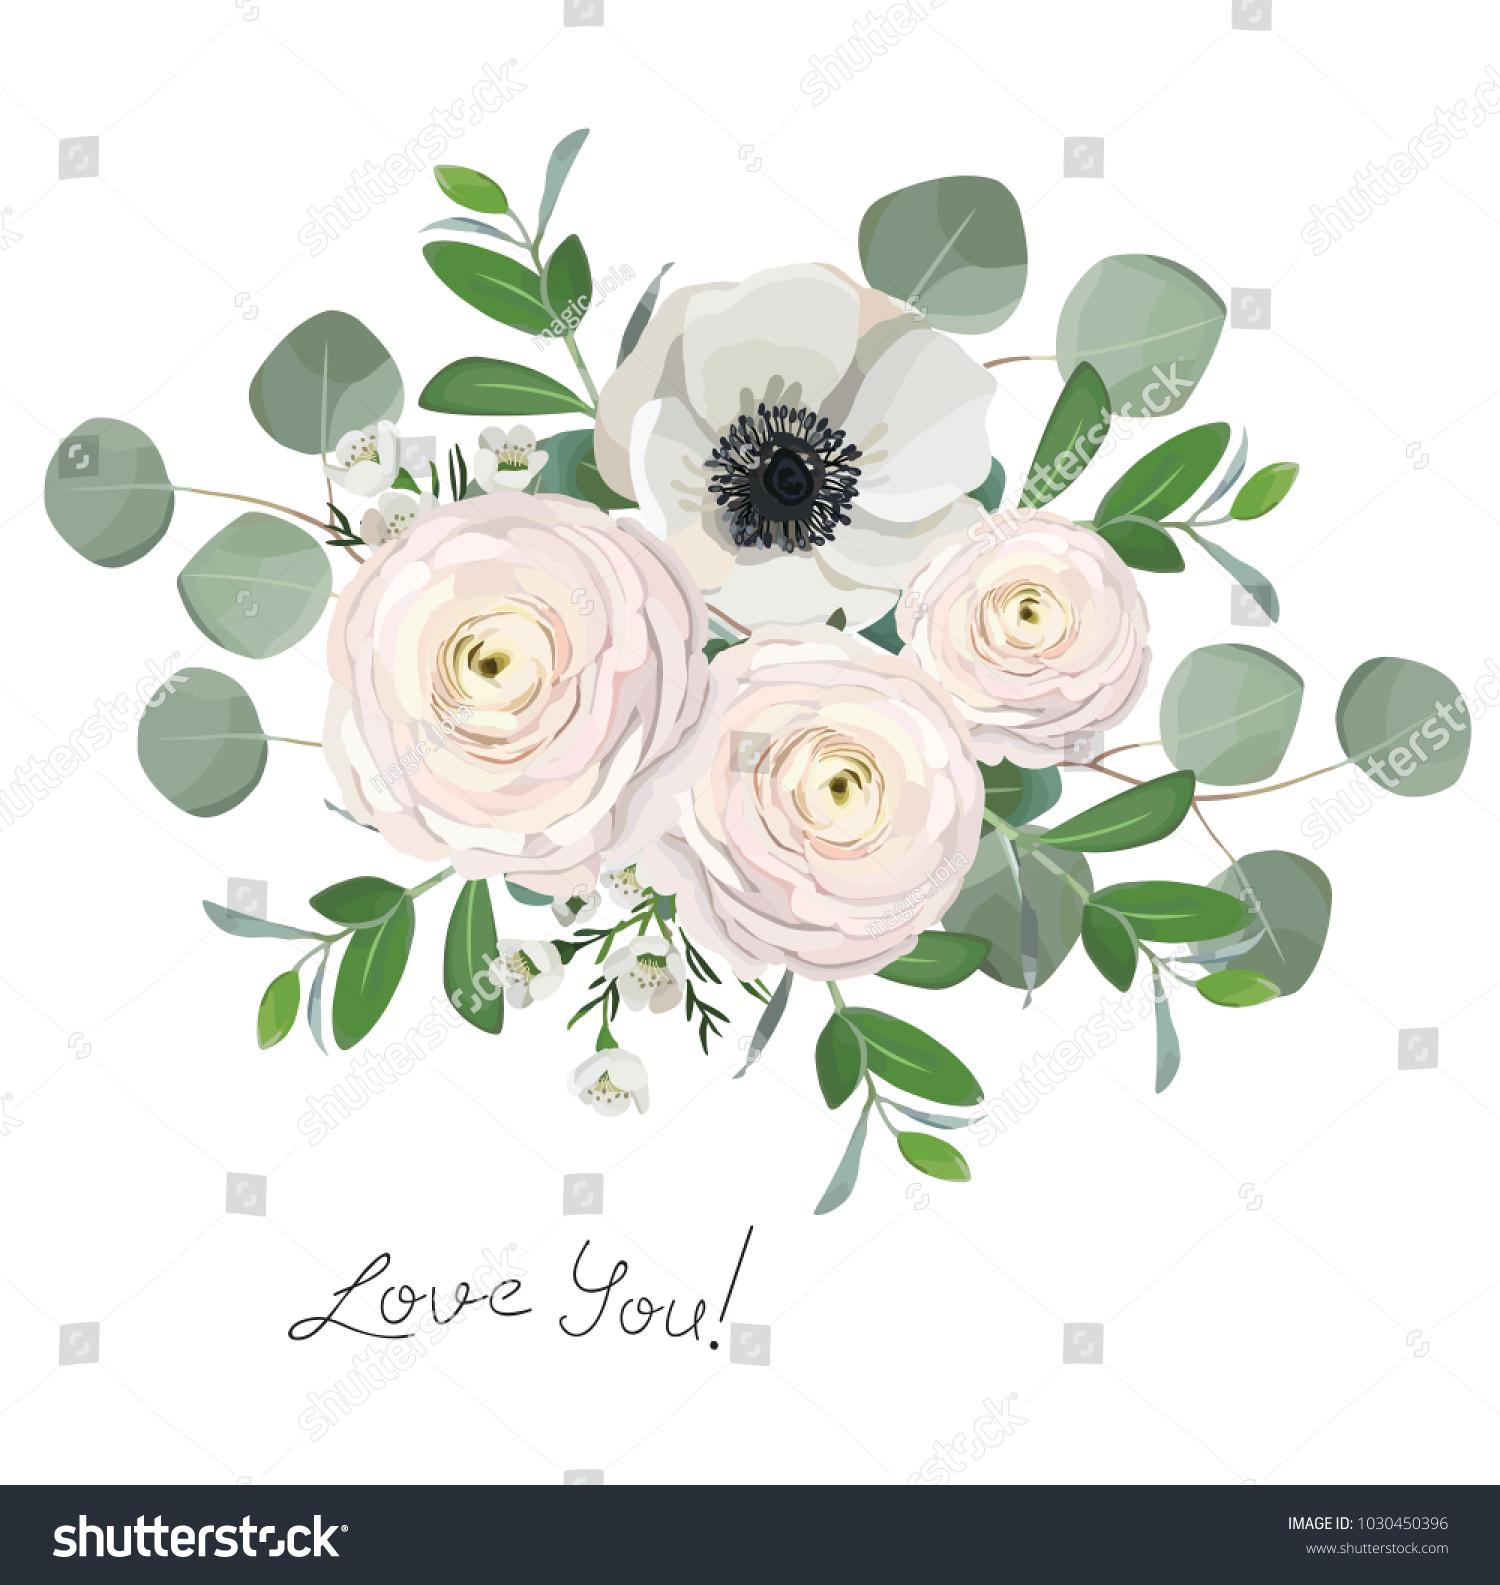 Ranunculus anemone eucalyptus flowers bouquet illustration stock ranunculus anemone eucalyptus flowers bouquet illustration izmirmasajfo